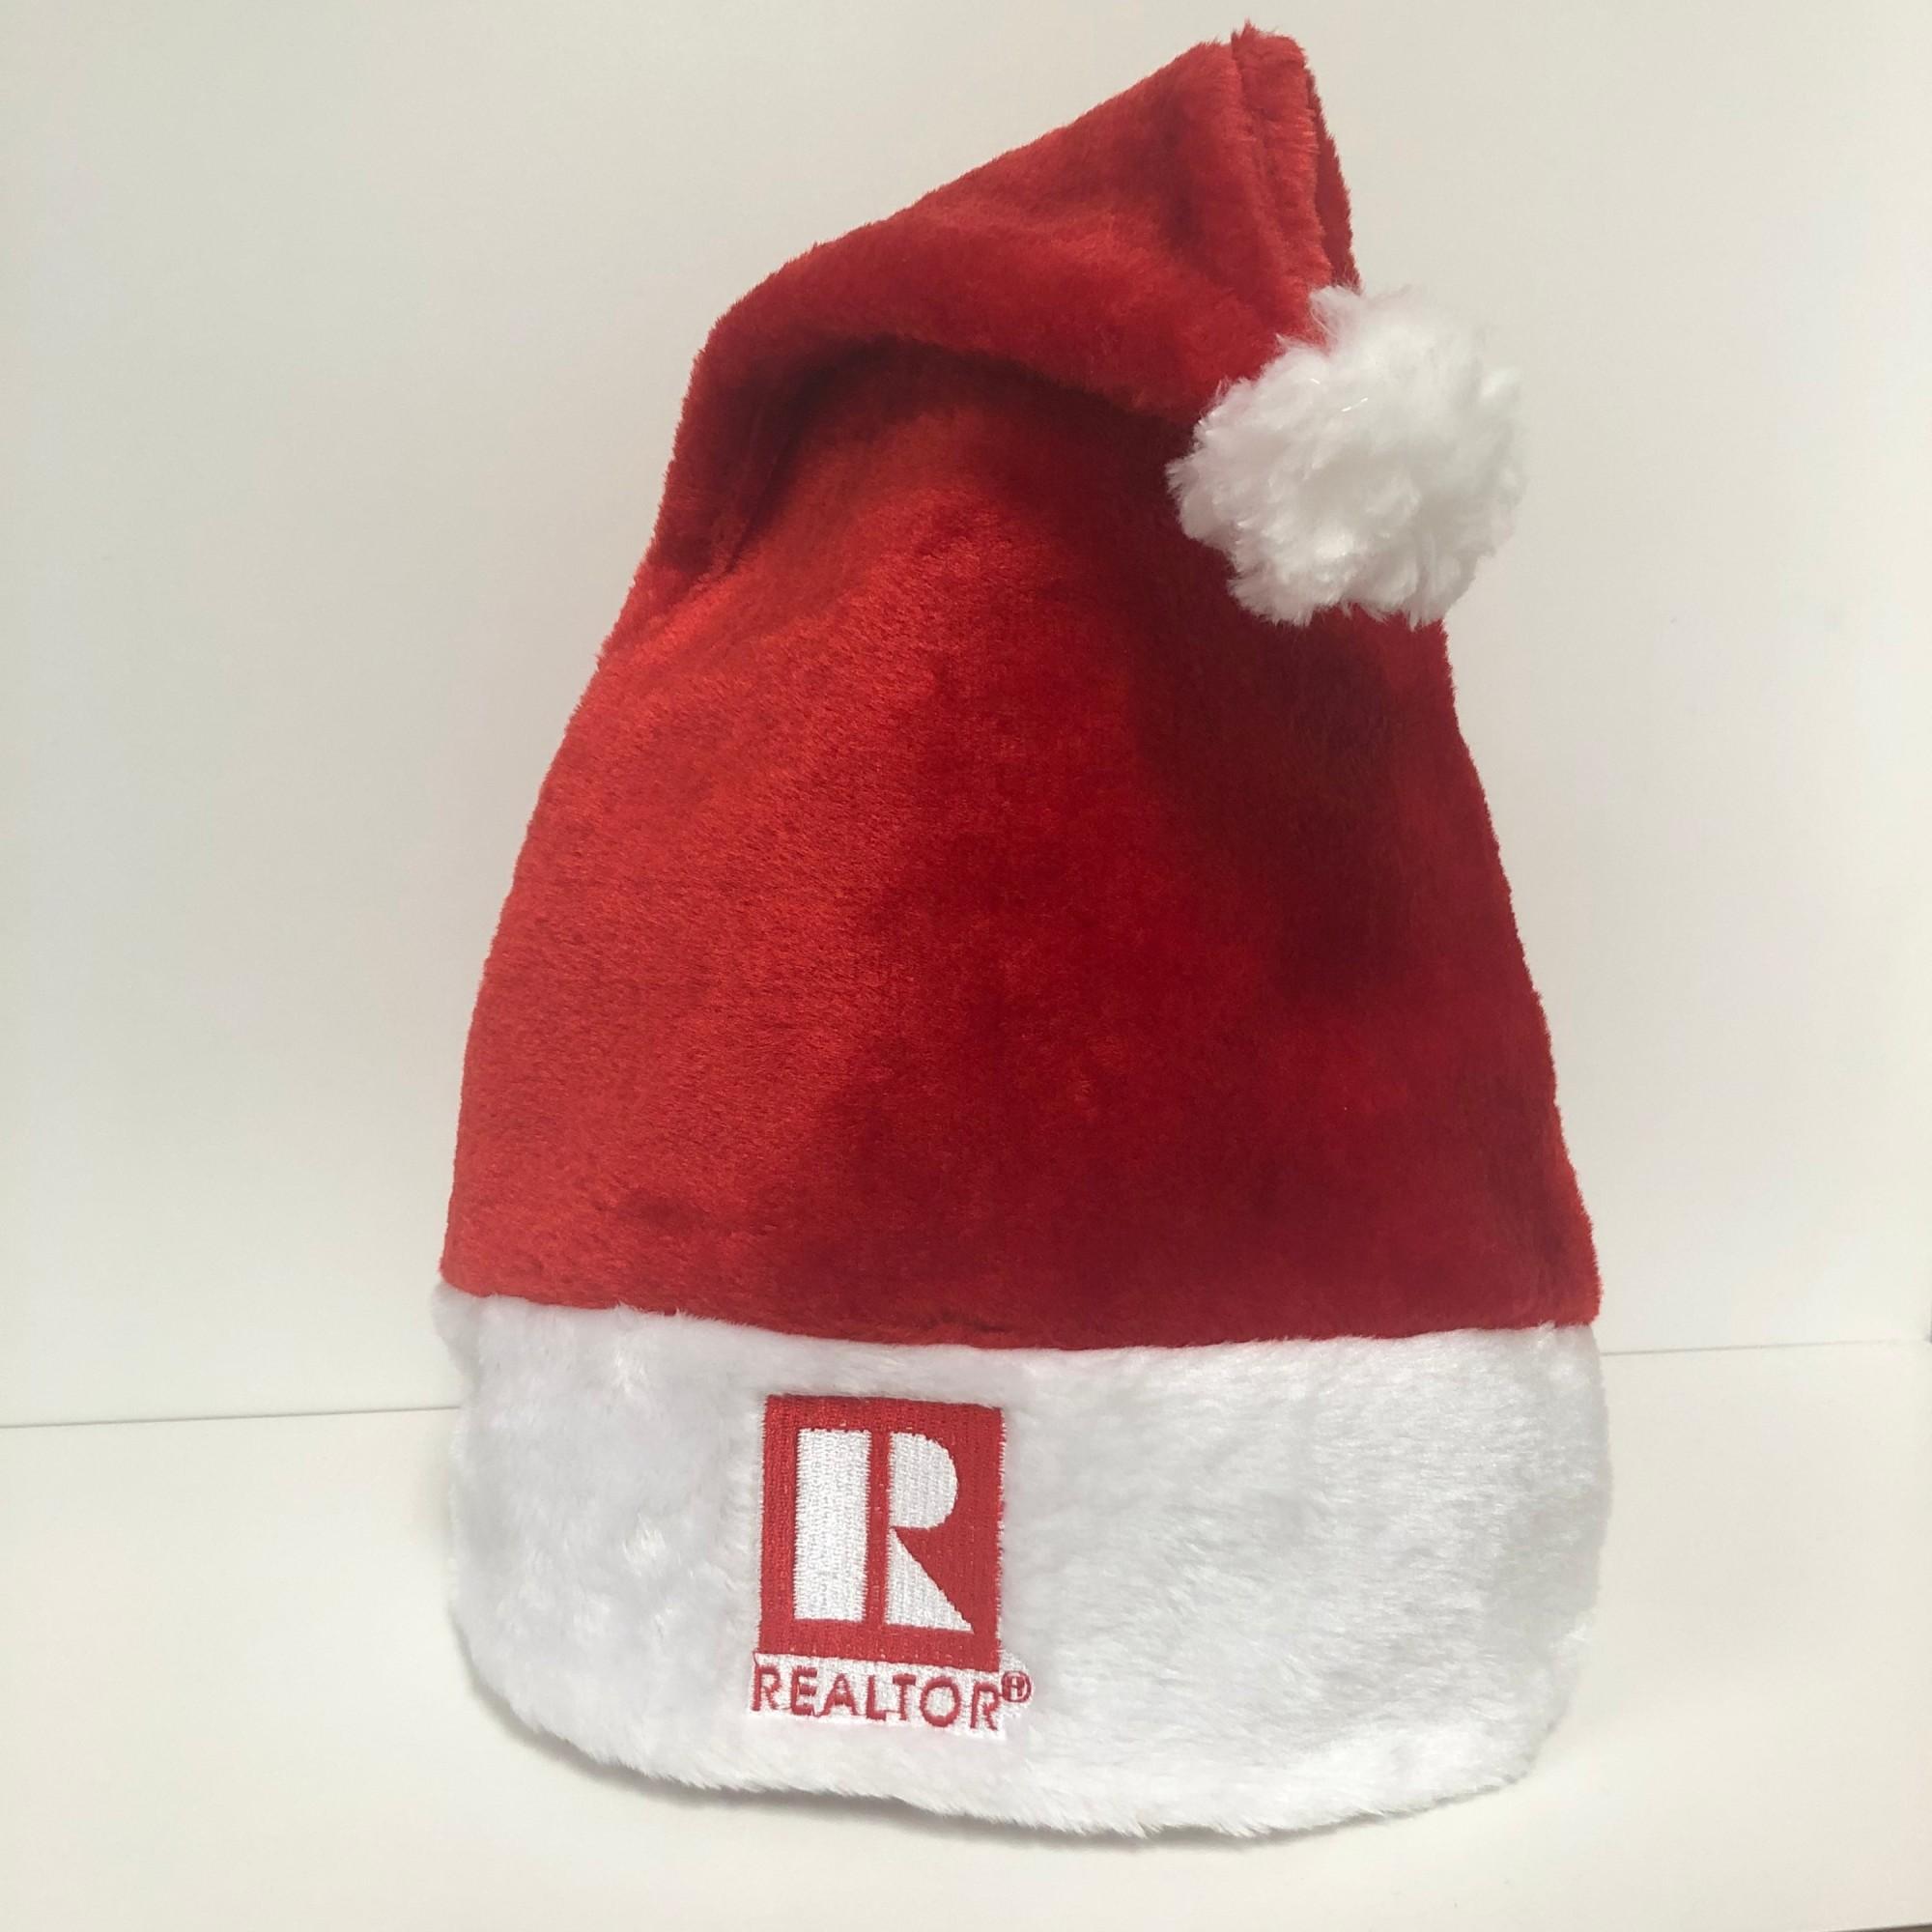 REALTOR, Santa hat, real estate, realtor holiday